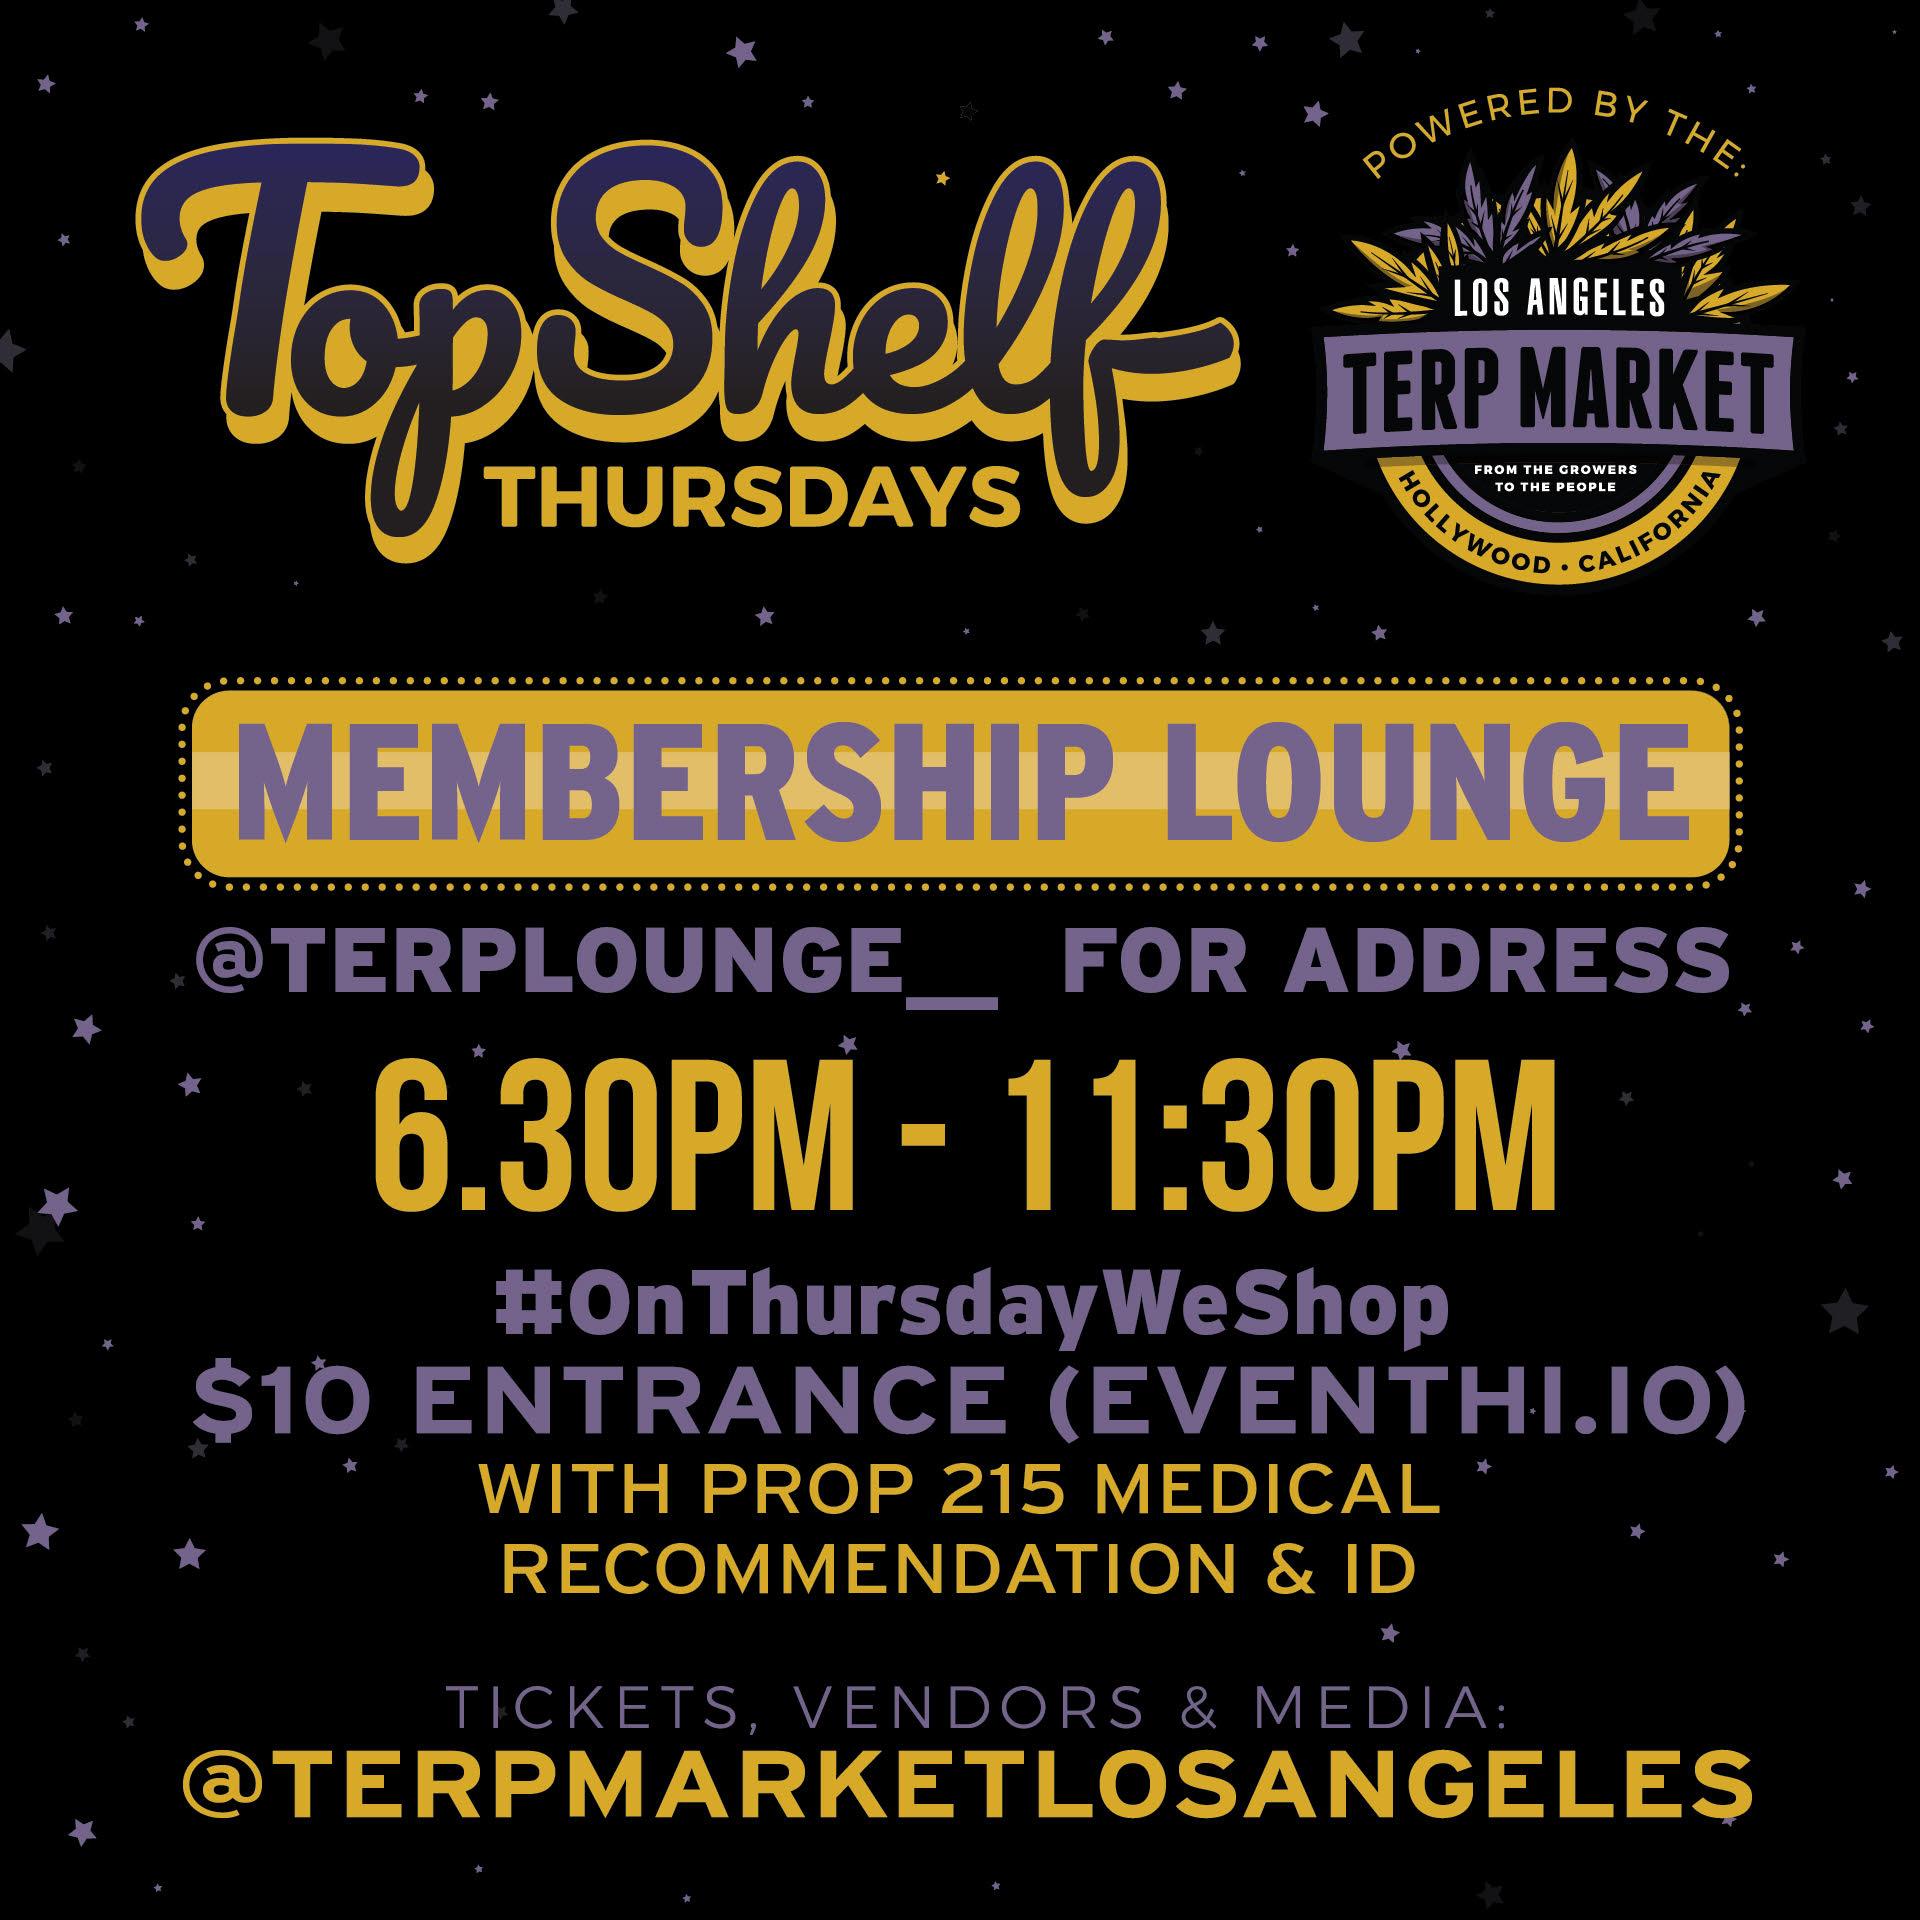 Terp Market Top Shelf Thursday Los Angeles 4/25